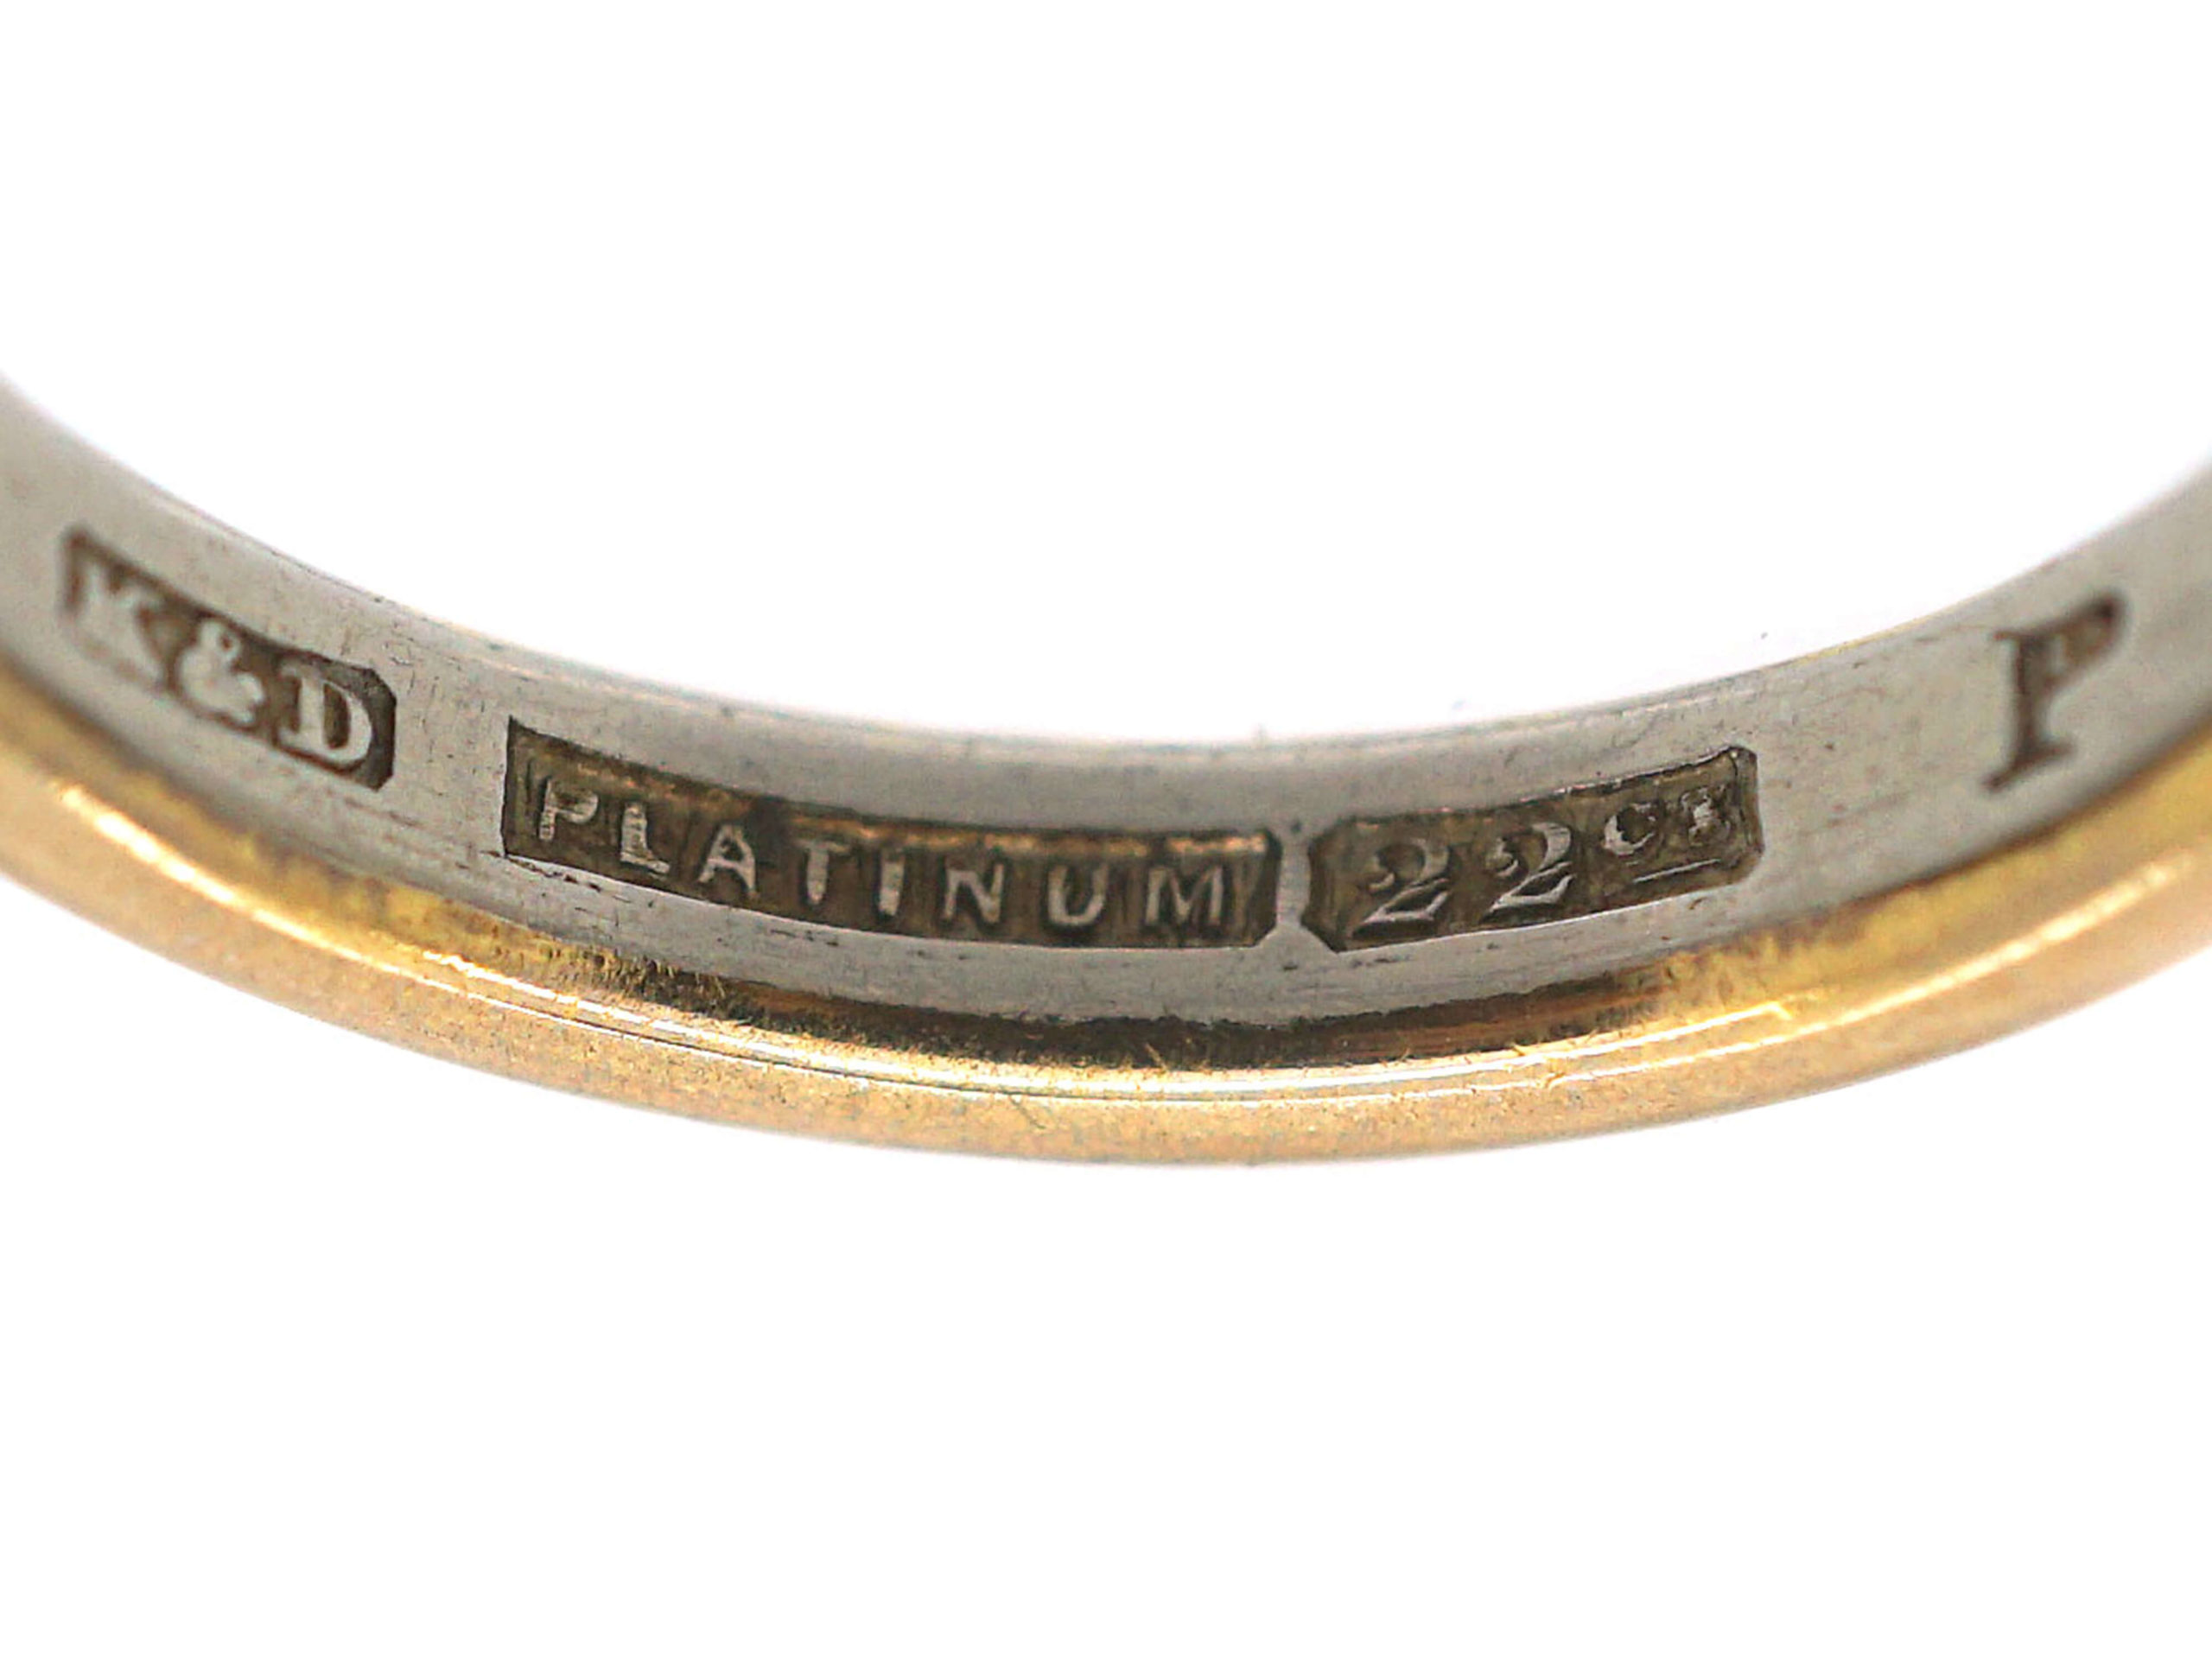 Platinum & 22ct Gold Wedding Ring